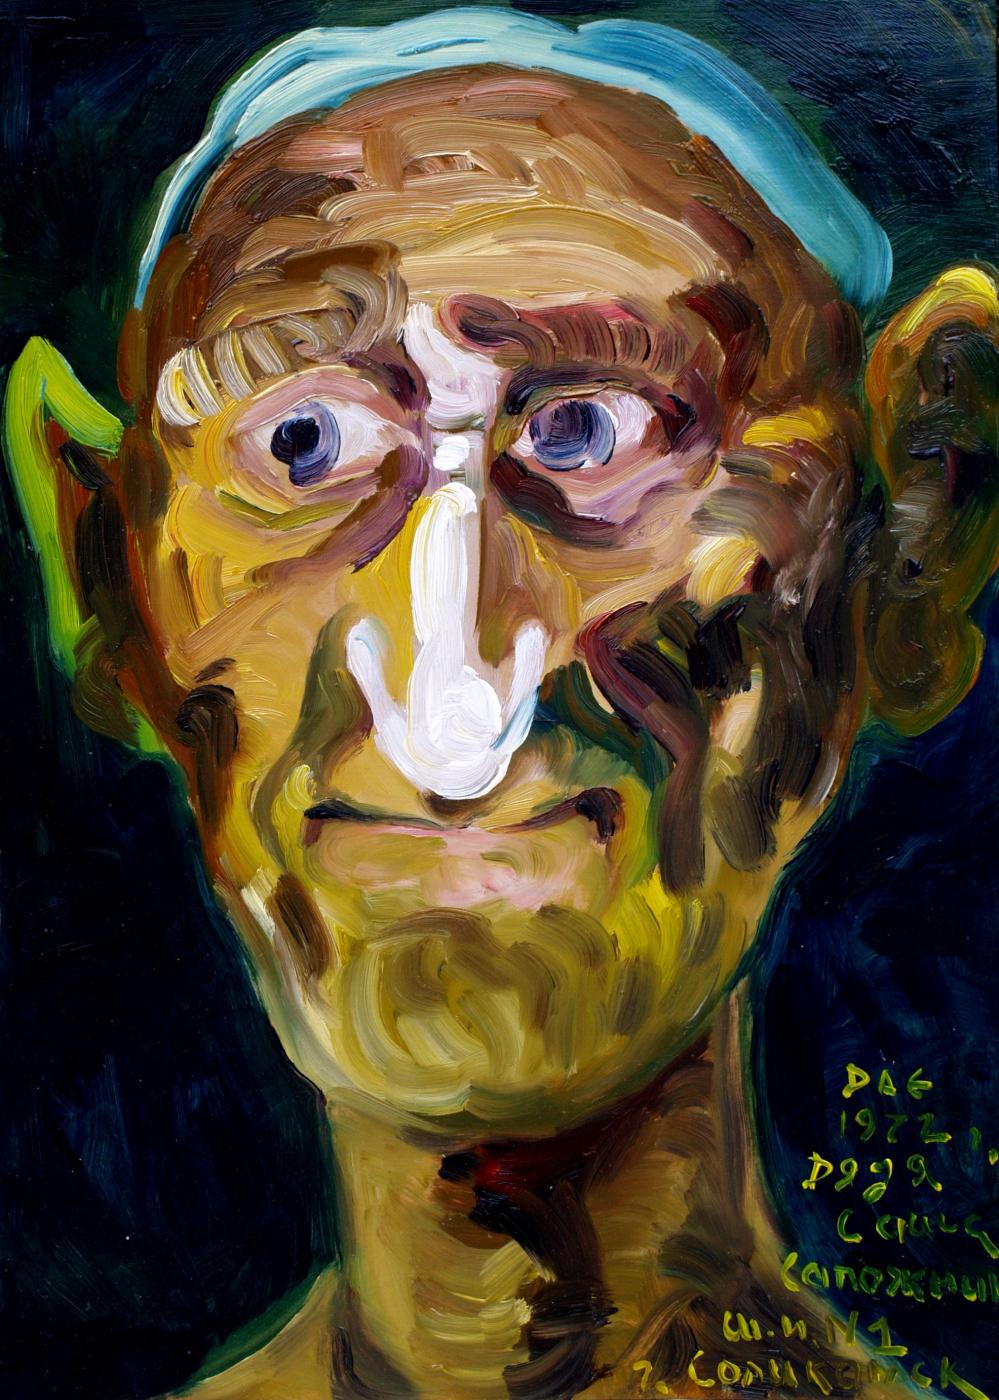 Alexander Ocher Kandinsky-DAE. Uncle Sasha (Shoemaker at boarding school No. 1, Solikamsk. Oil on cardboard, 49-35, 1973.